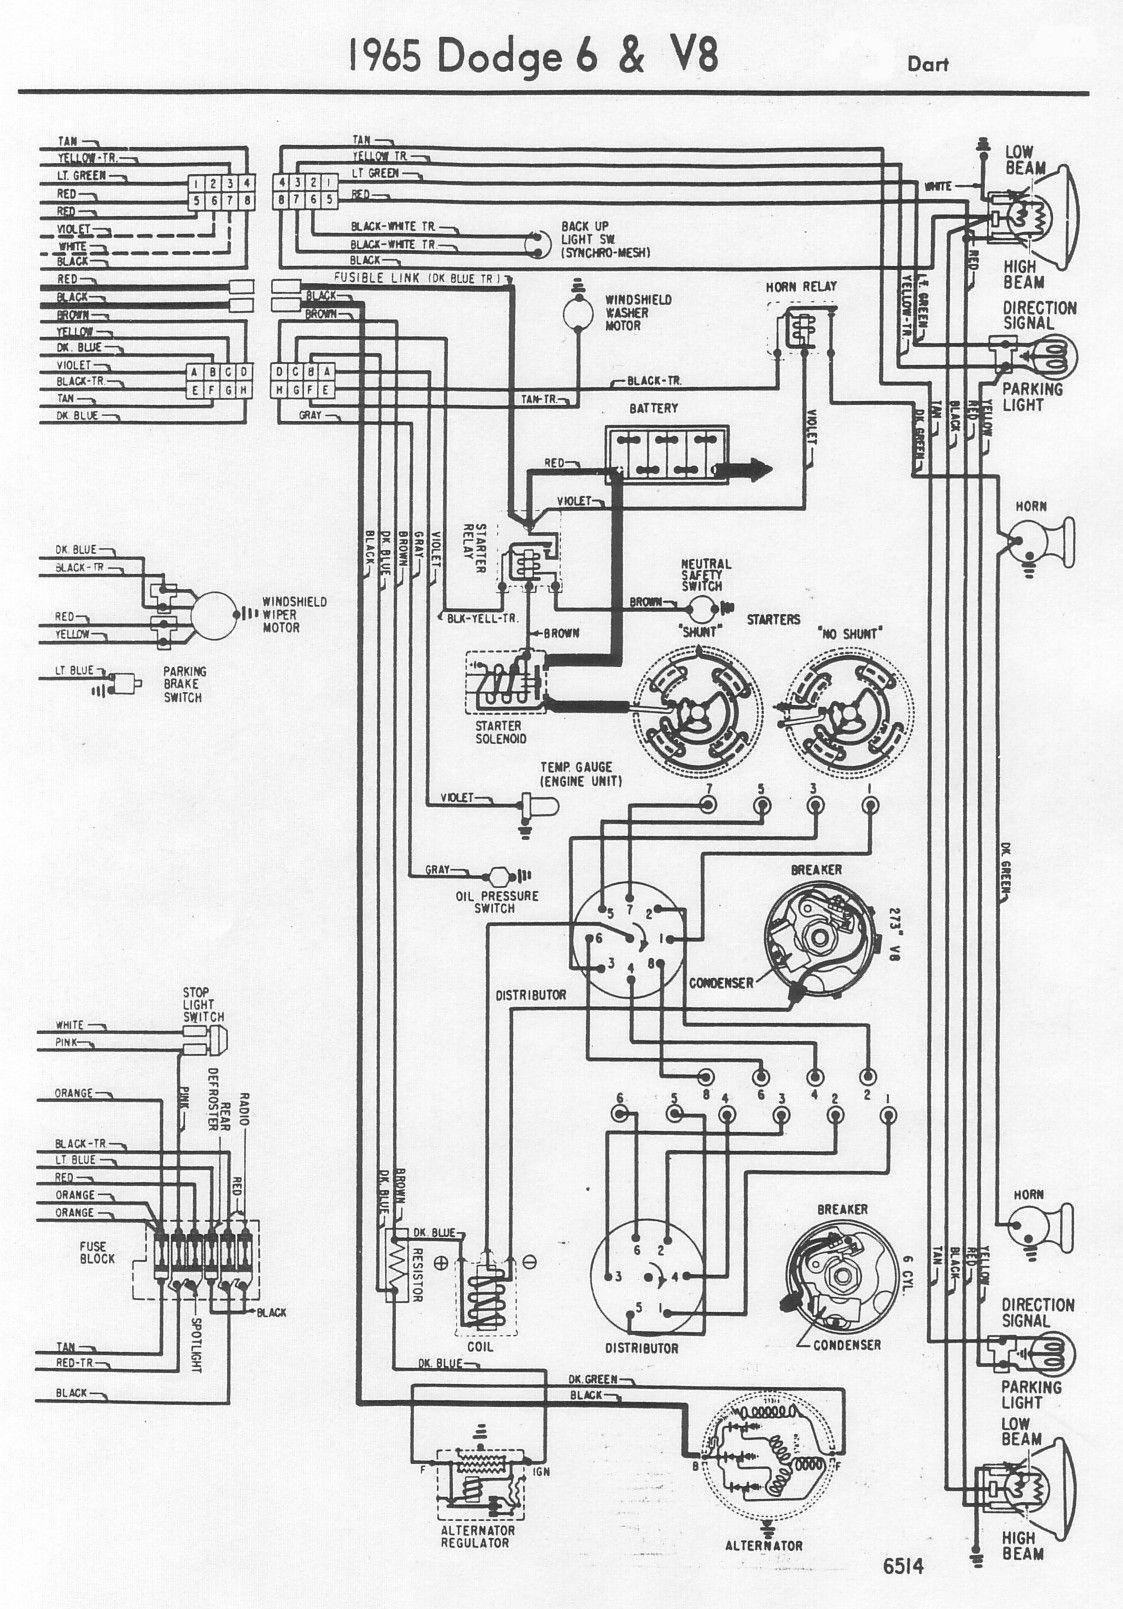 65 dodge dart wiring diagram 67 dodge dart wiring diagram